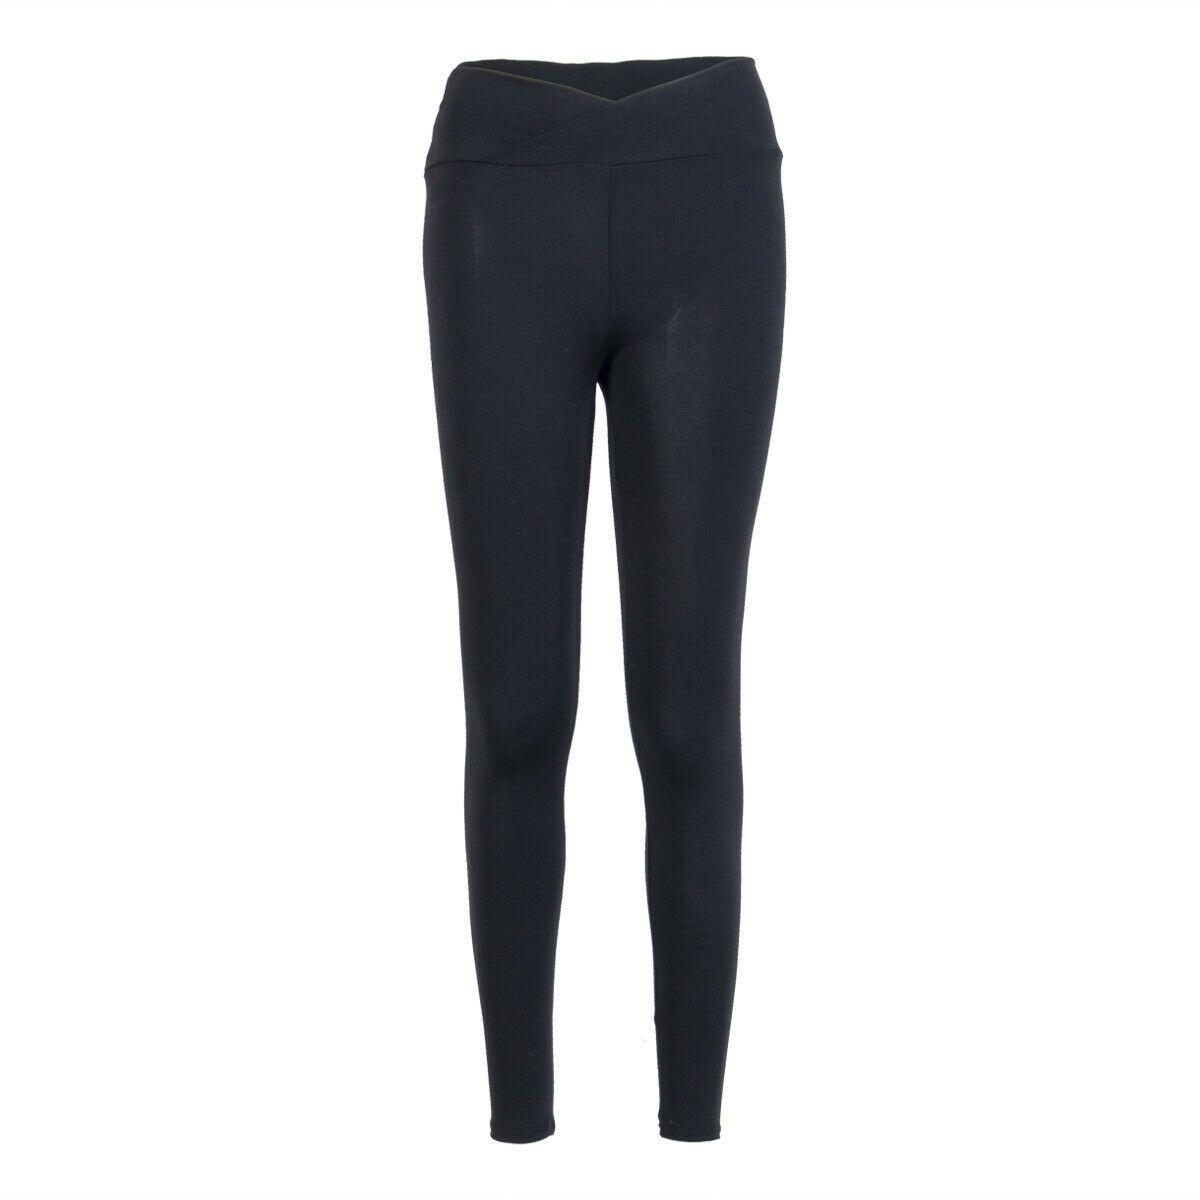 Bayan Yoga Spor Tayt Koşu Atletik Spor Streç Uzun Pantolon Pantolon